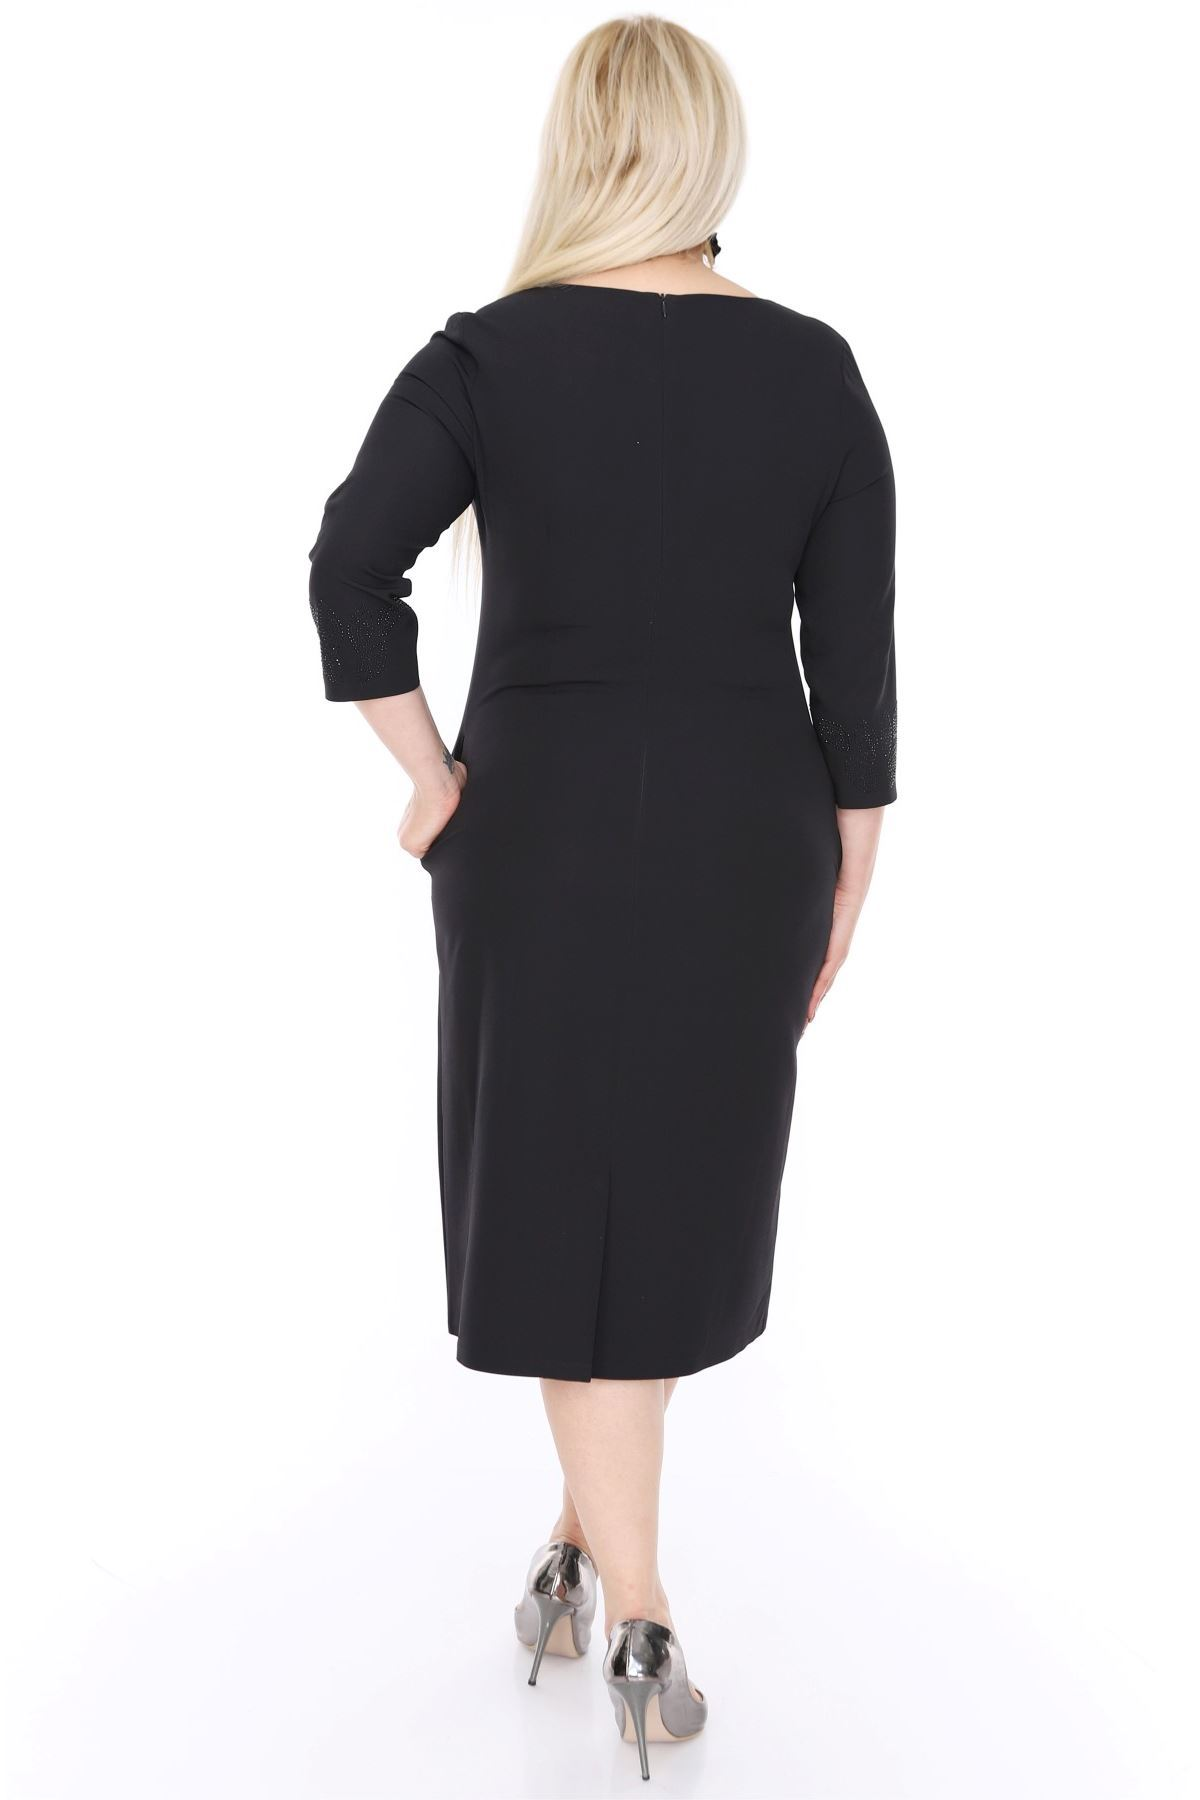 Taşlı Cepli Siyah Elbise H3-0453